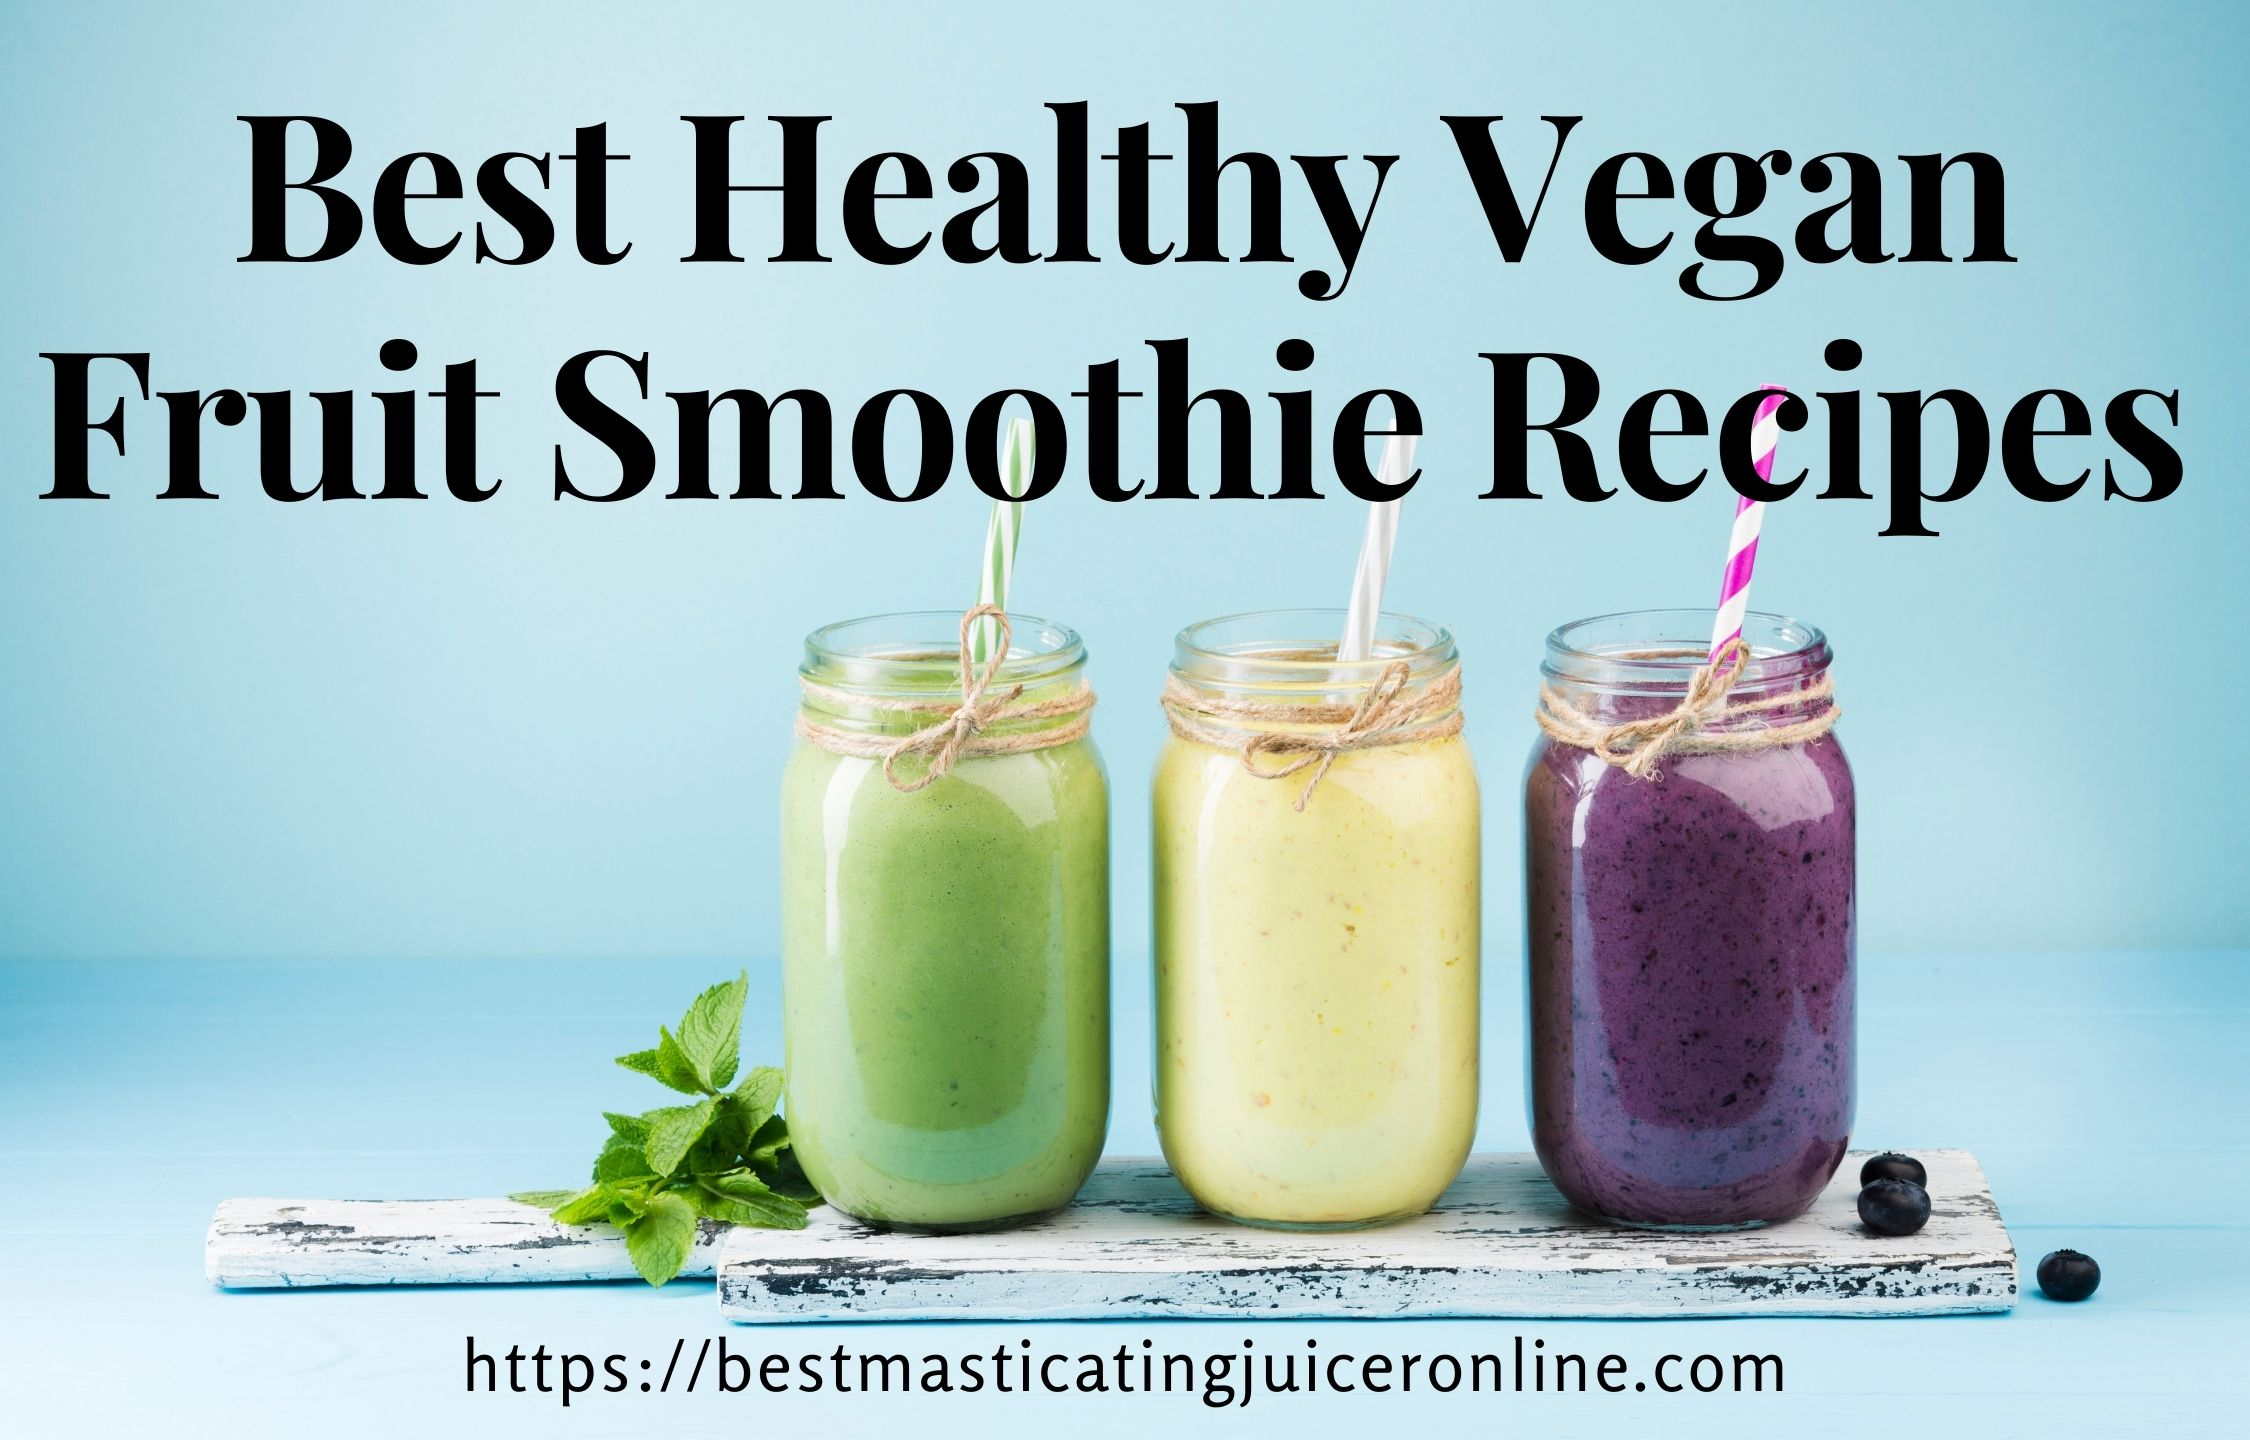 10 Best Healthy Vegan Fruit Smoothie Recipes | Vegetarian Choice